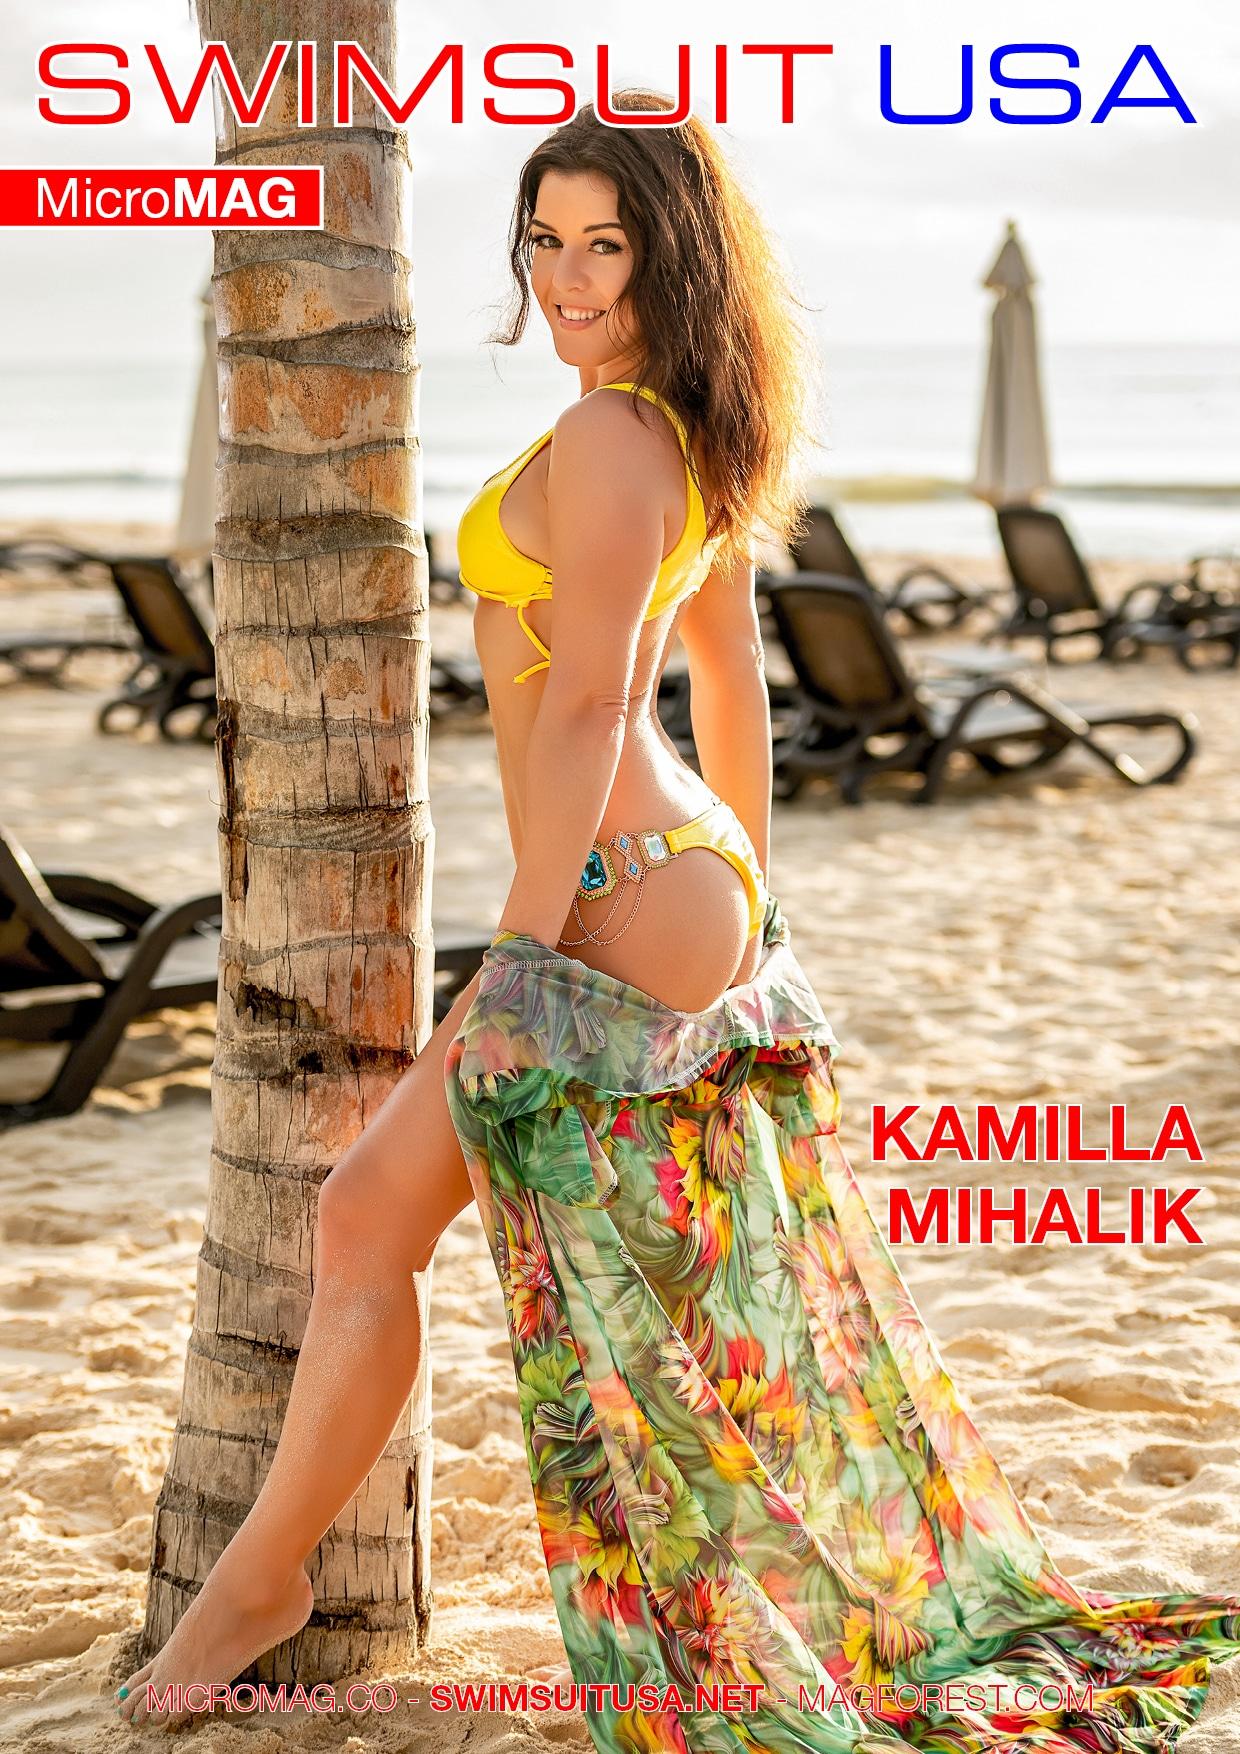 Swimsuit USA MicroMAG - Kamilla Mihalik - Issue 4 2